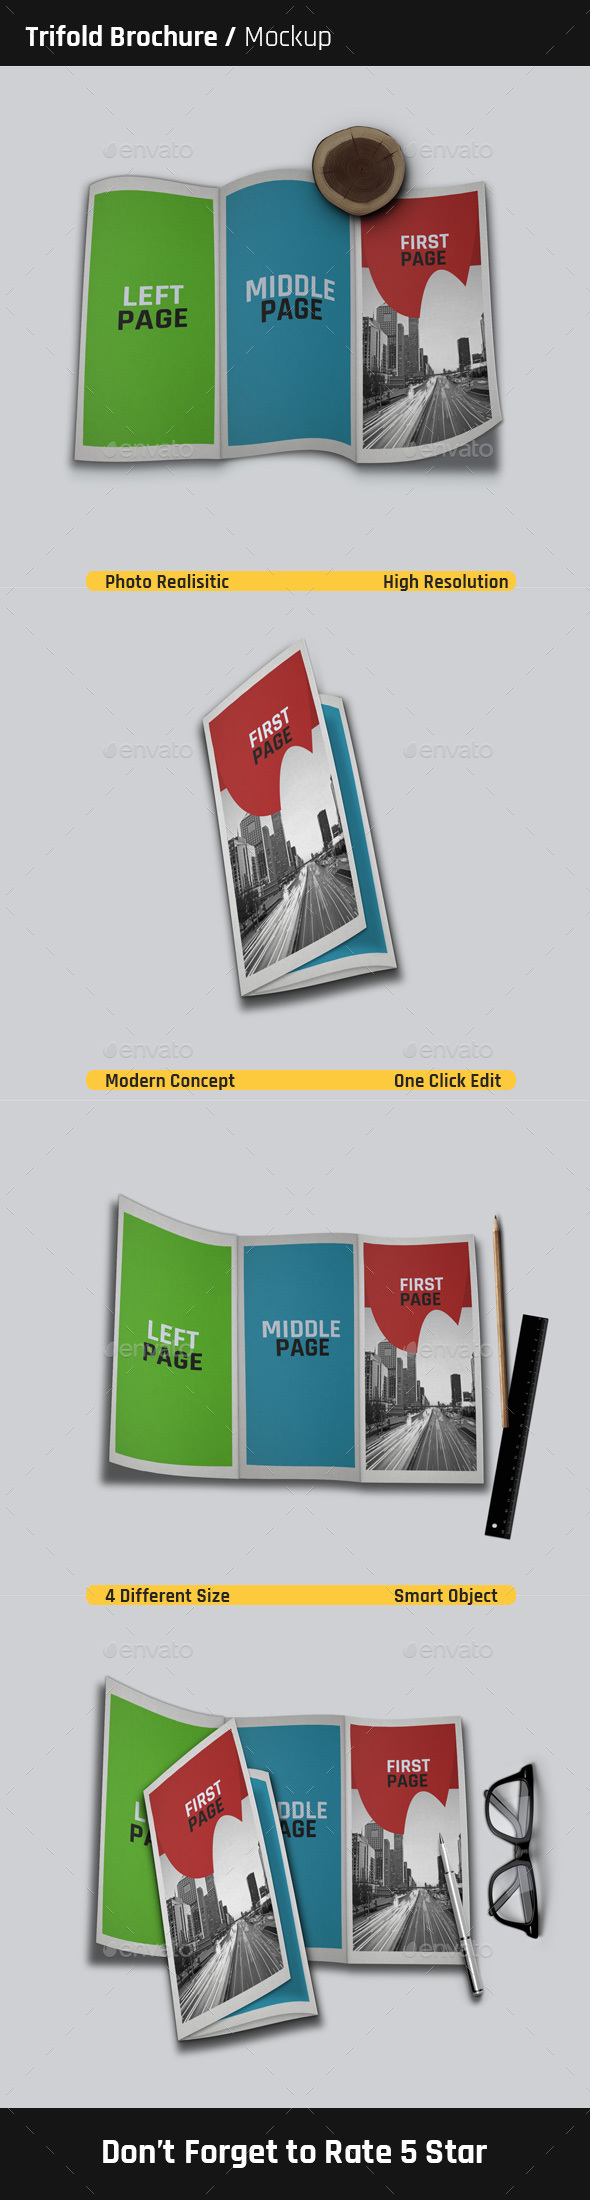 Trifold Brochure Mock-Ups  - Brochures Print